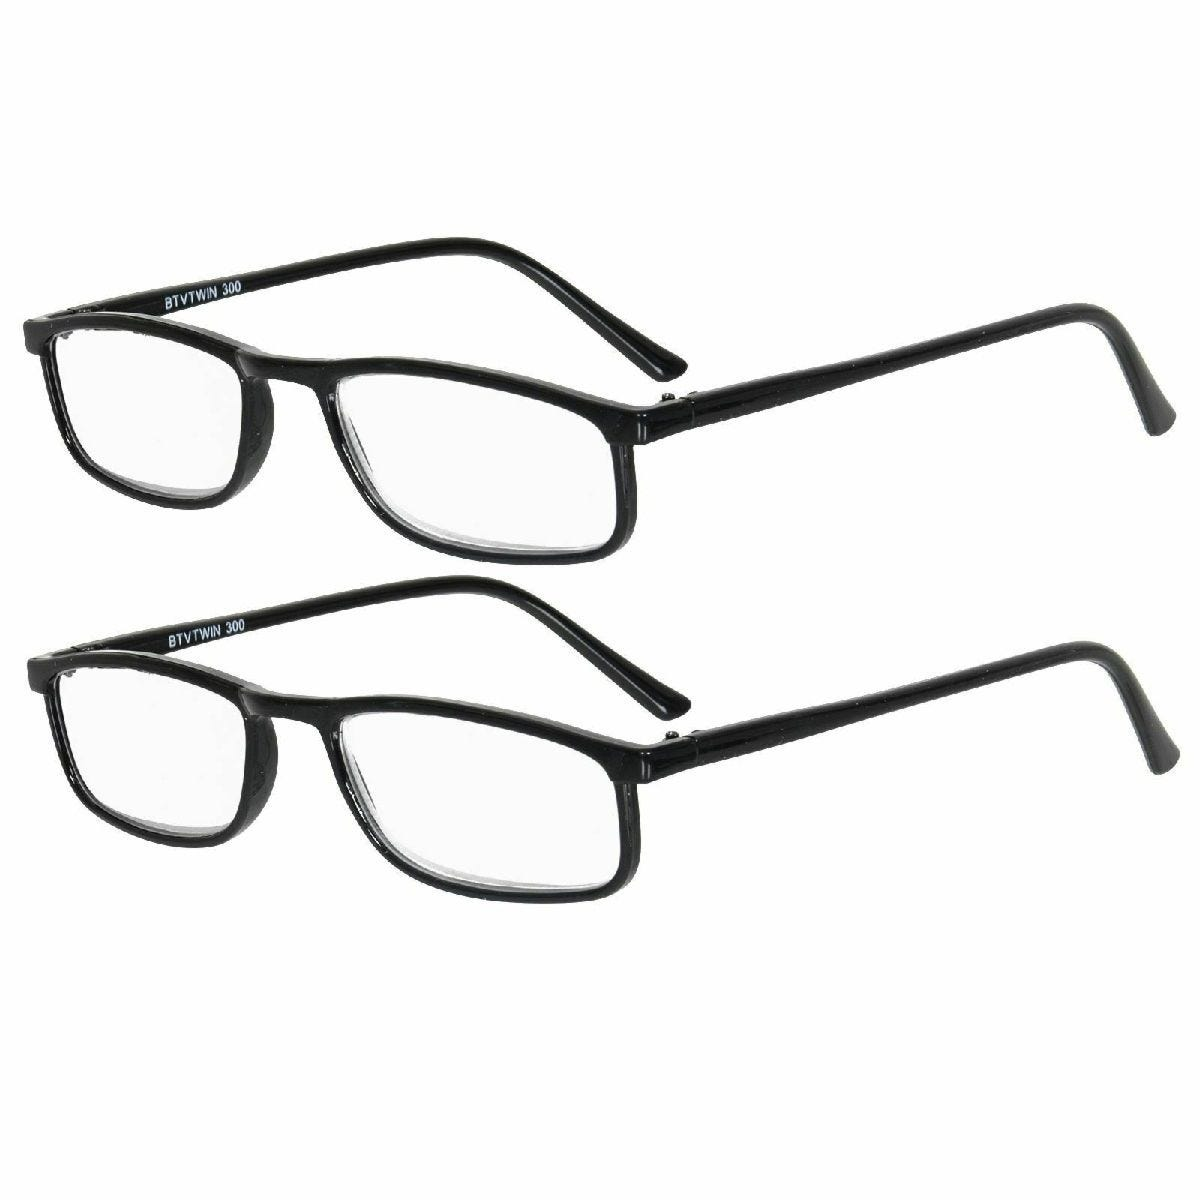 Betaview Duo Pack Strength 1.5 Unisex Reading Glasses - Black